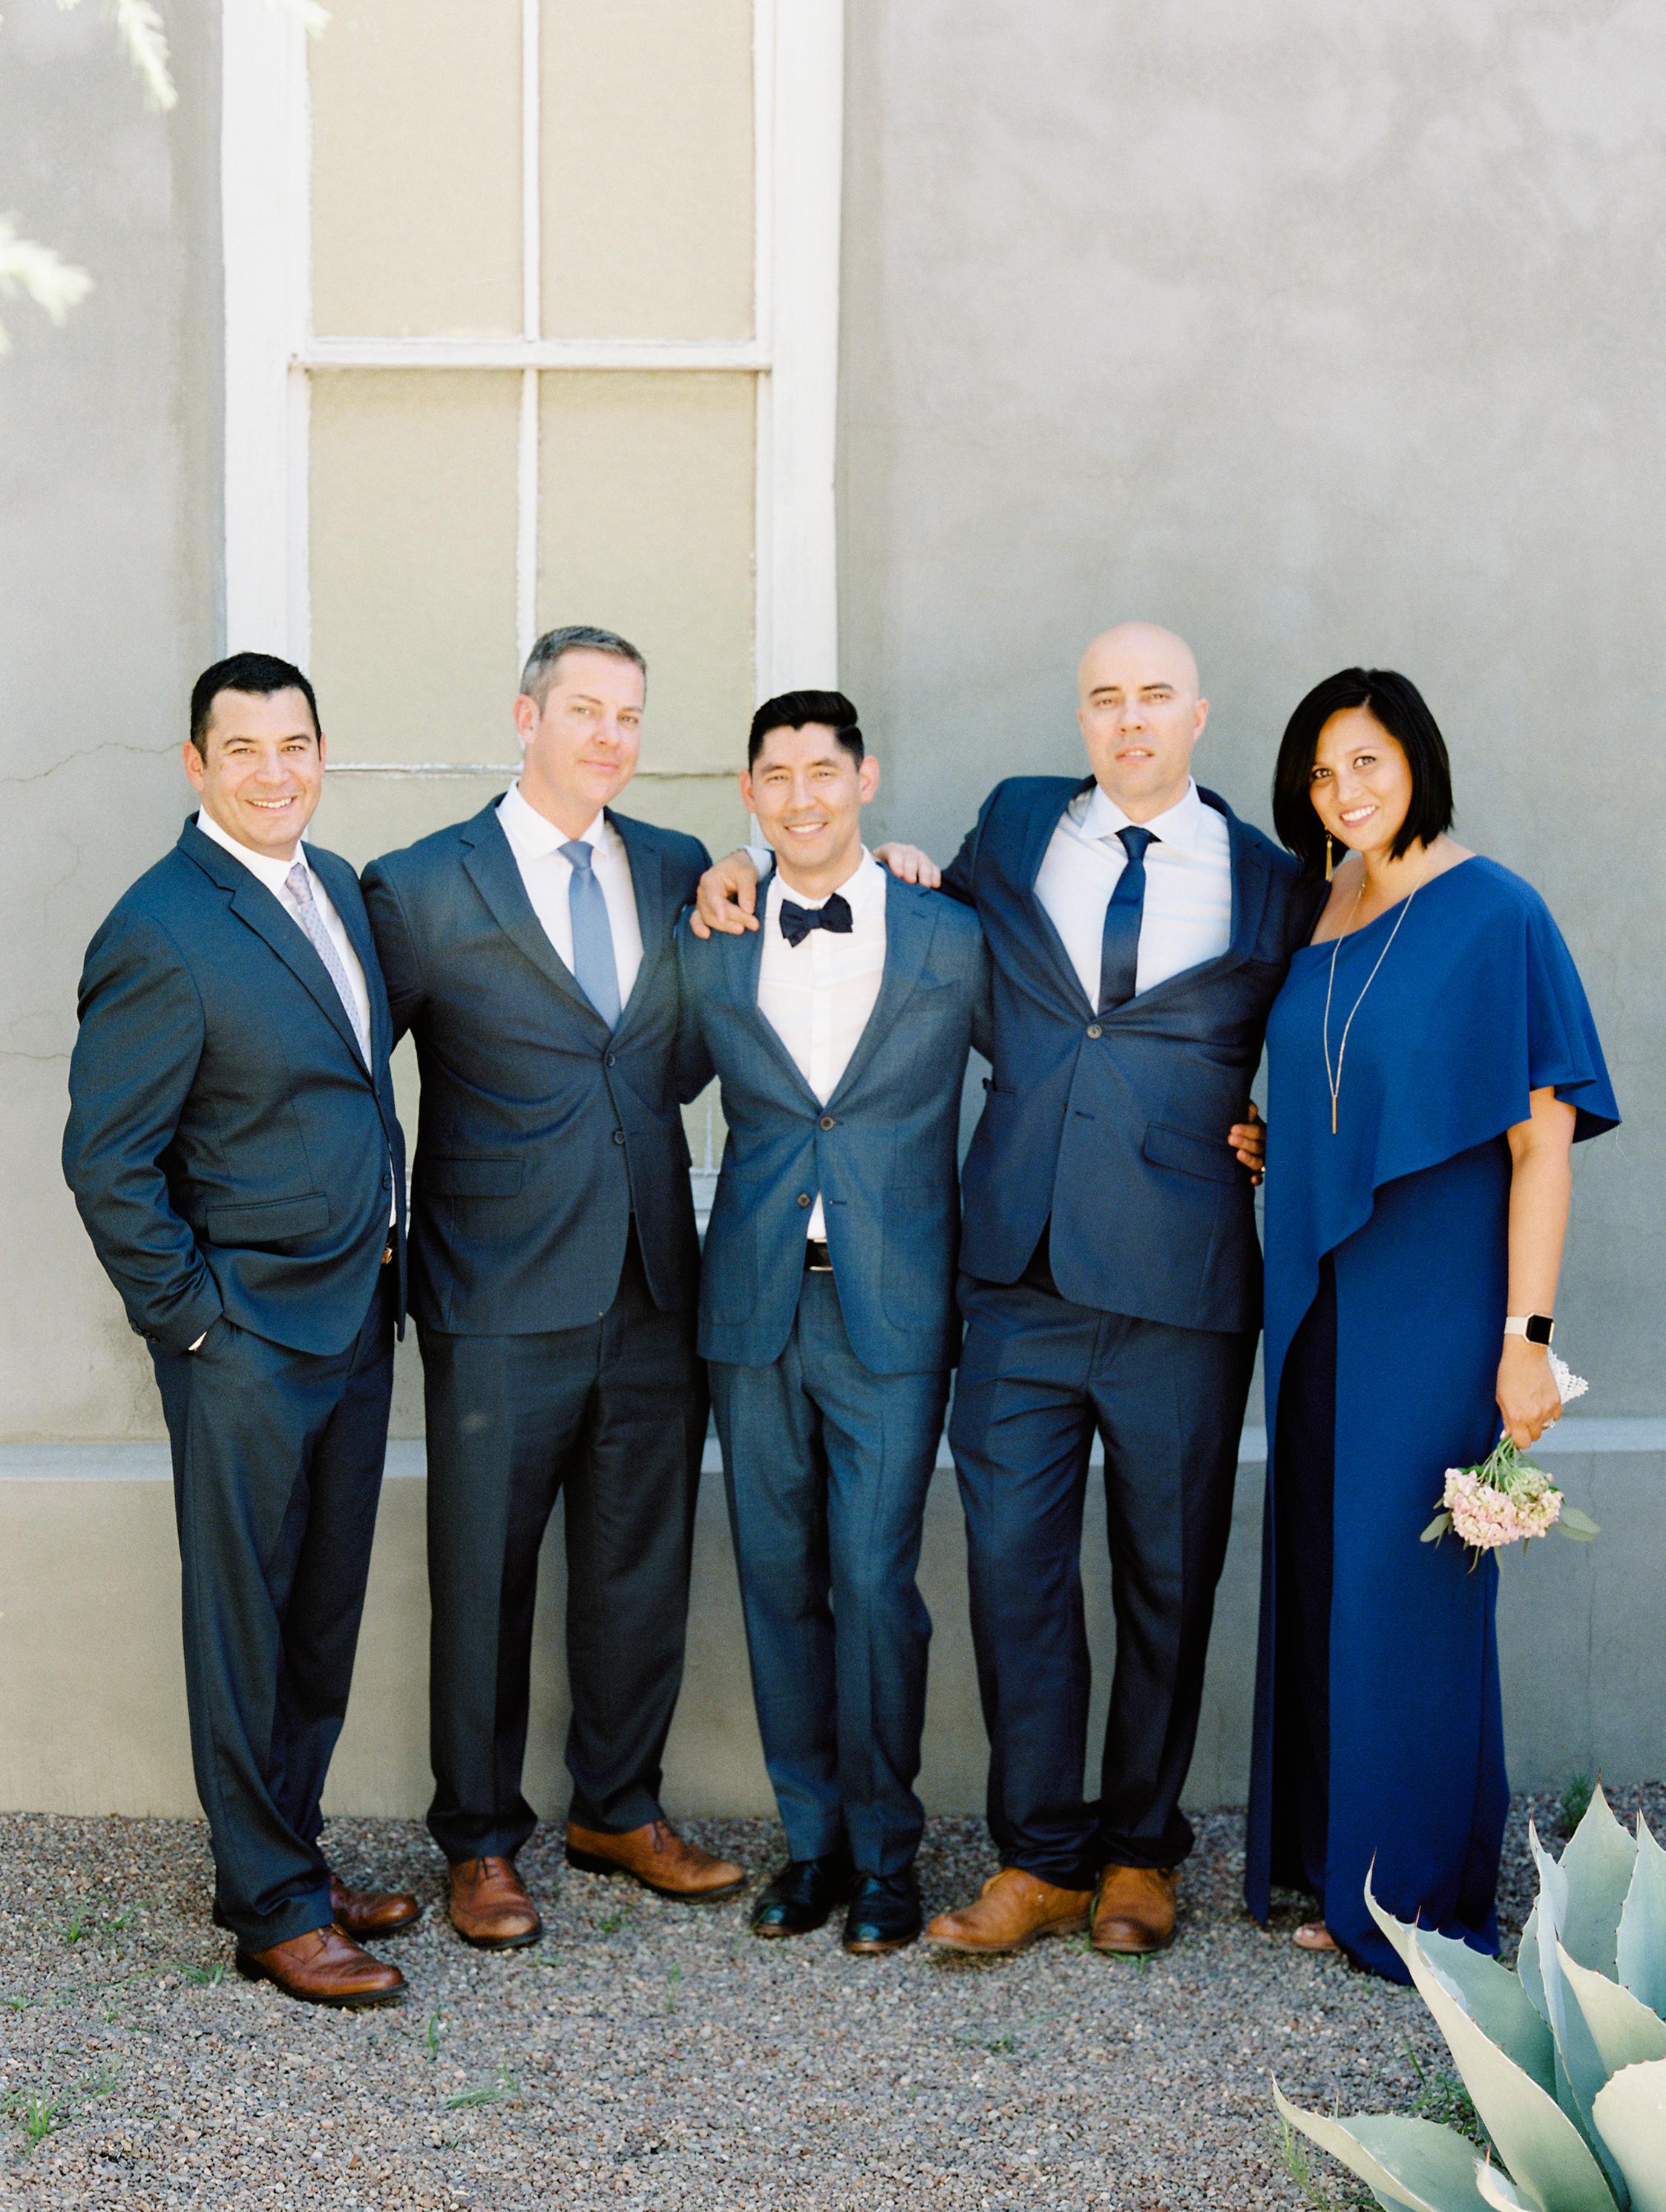 Best-Austin-Texas-Marfa-Wedding-Photographers-fine-art-film-258.jpg